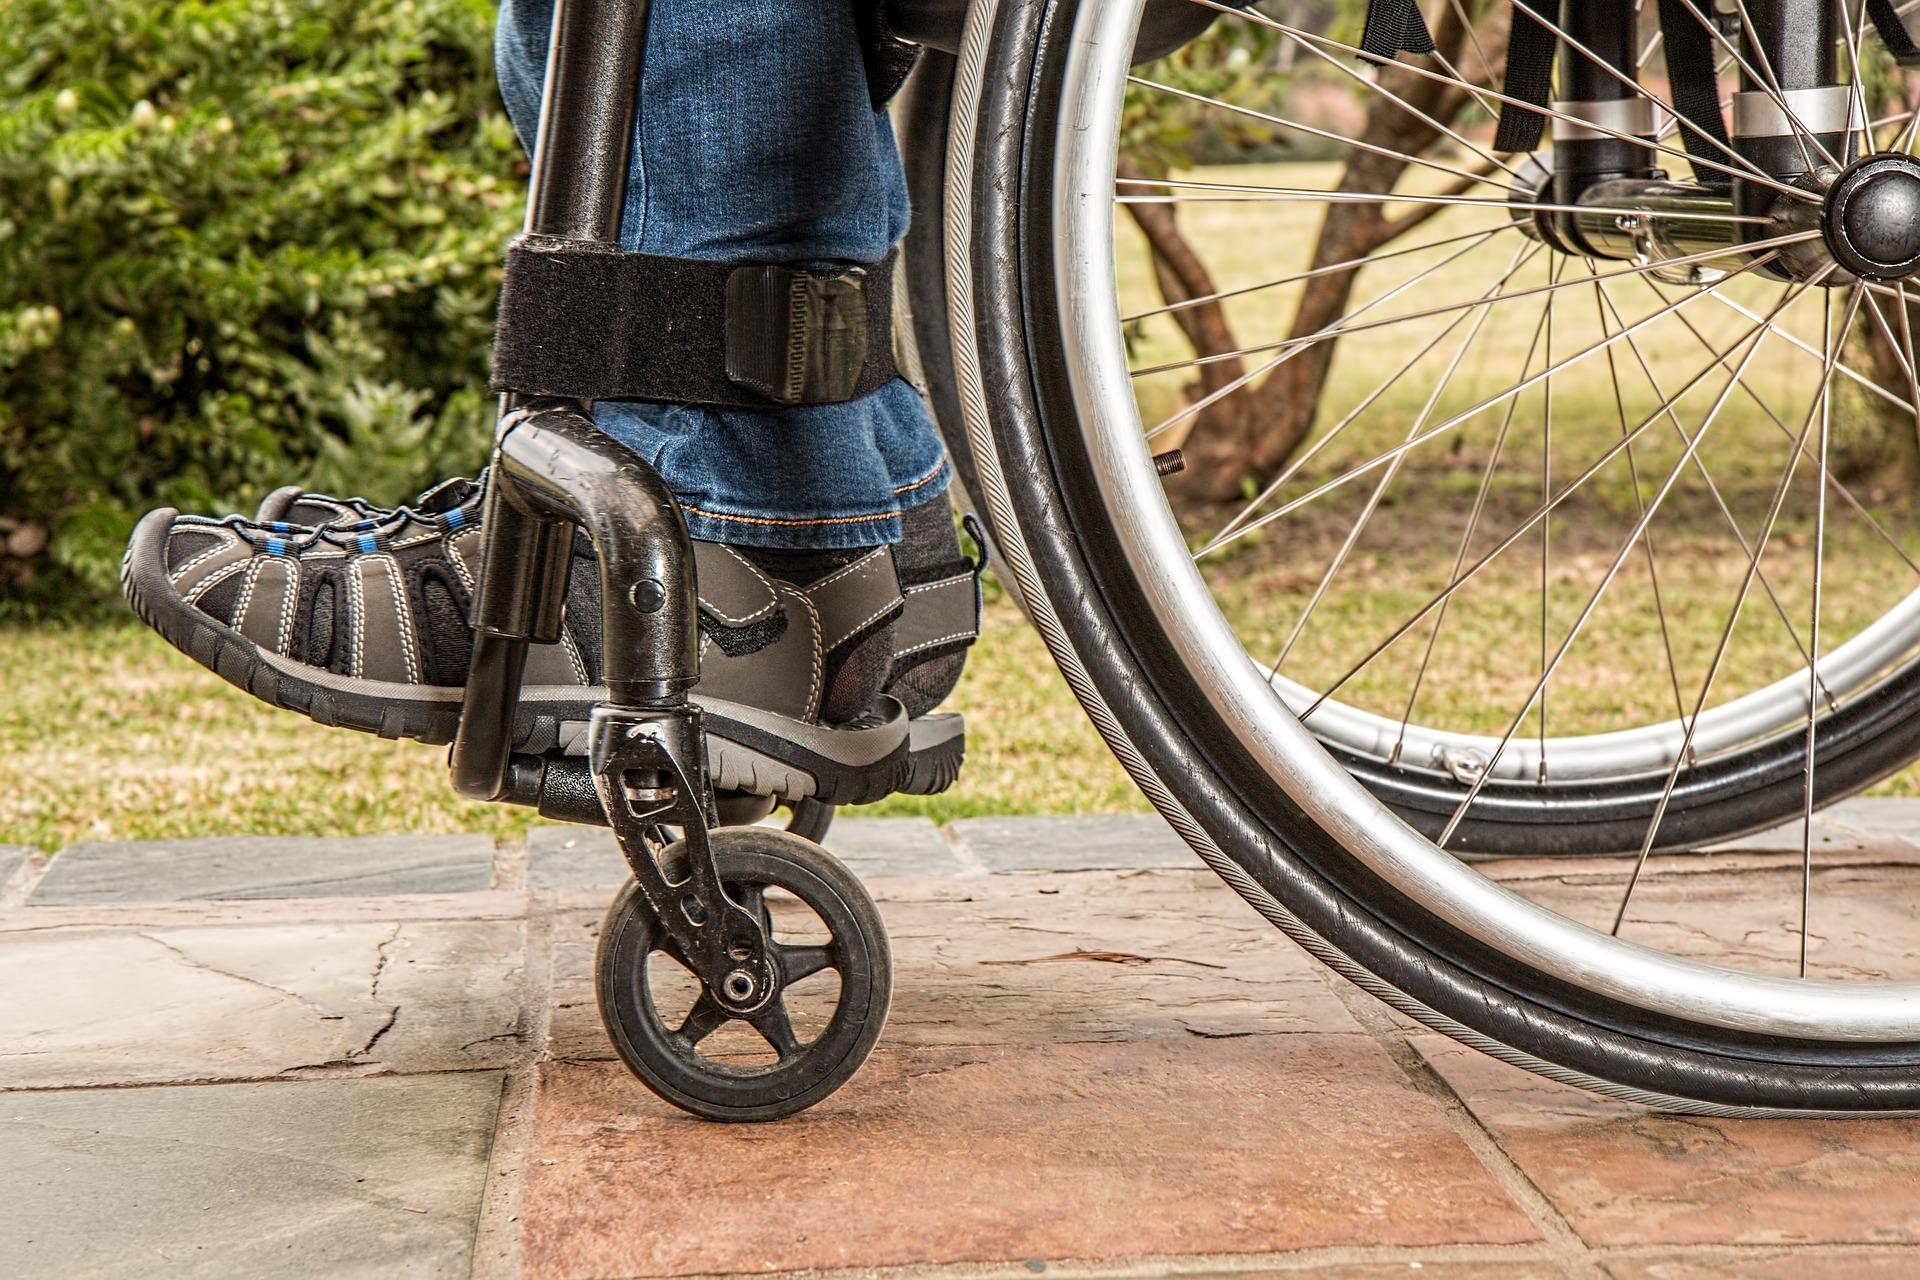 Leroy Merlin vorrebbe assumere disabili intellettivi - Featured image